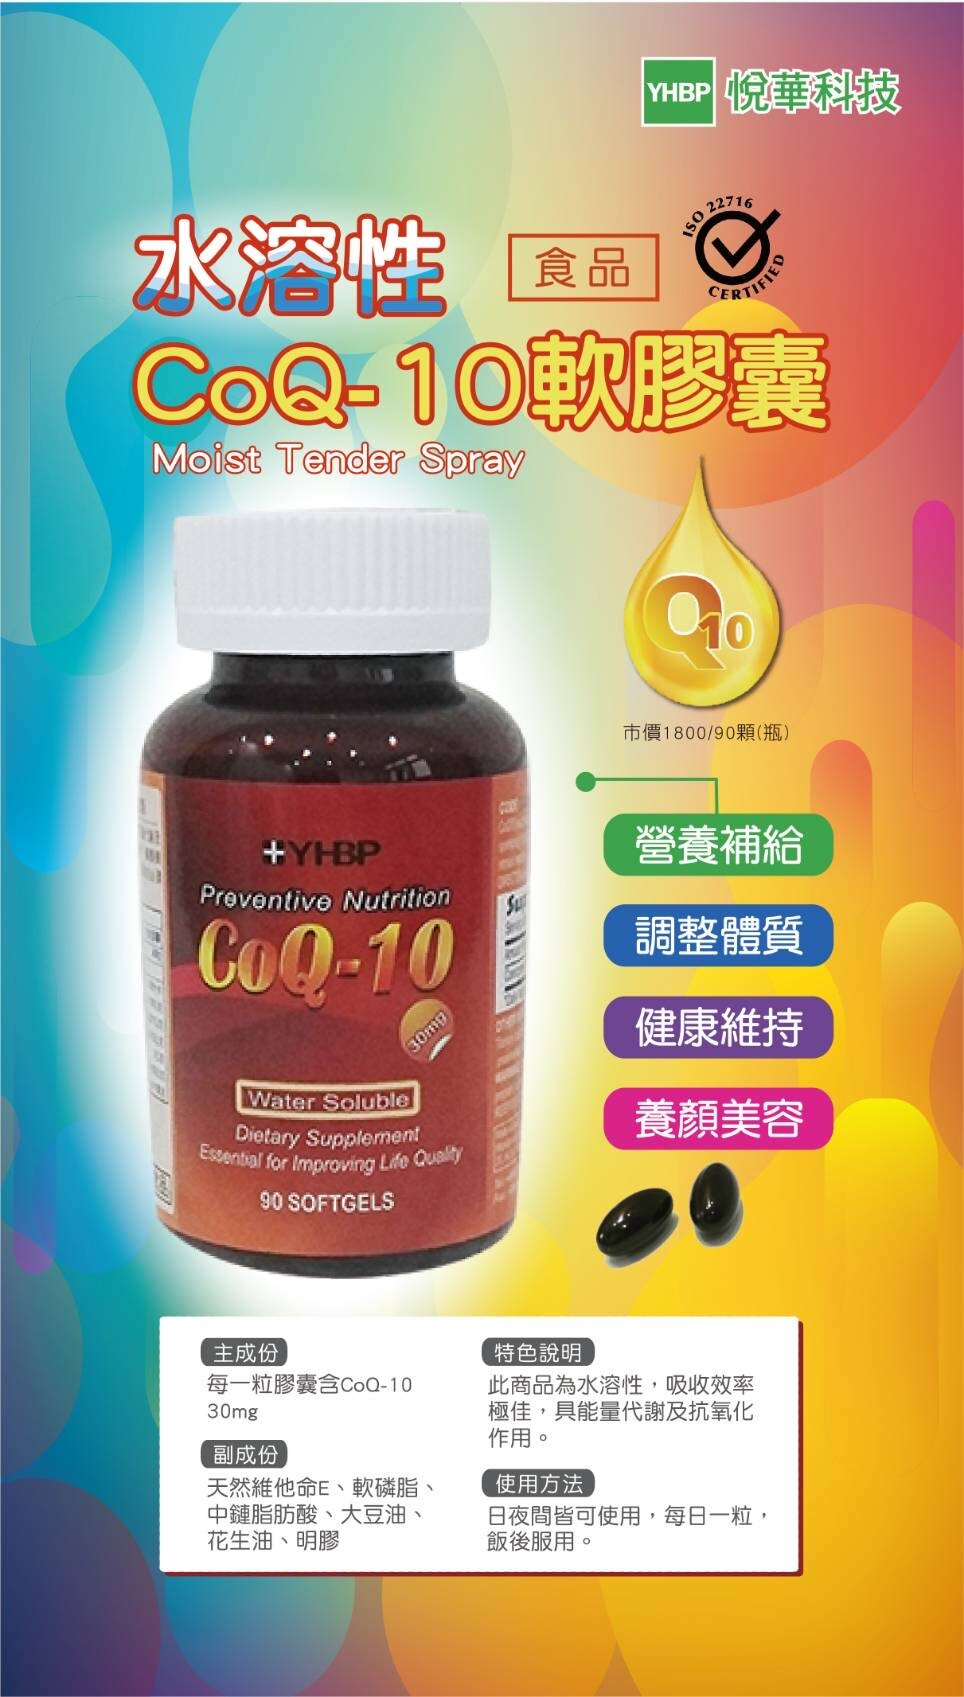 【YHBP】天然型輔酵素Co-Q10軟膠囊90顆裝